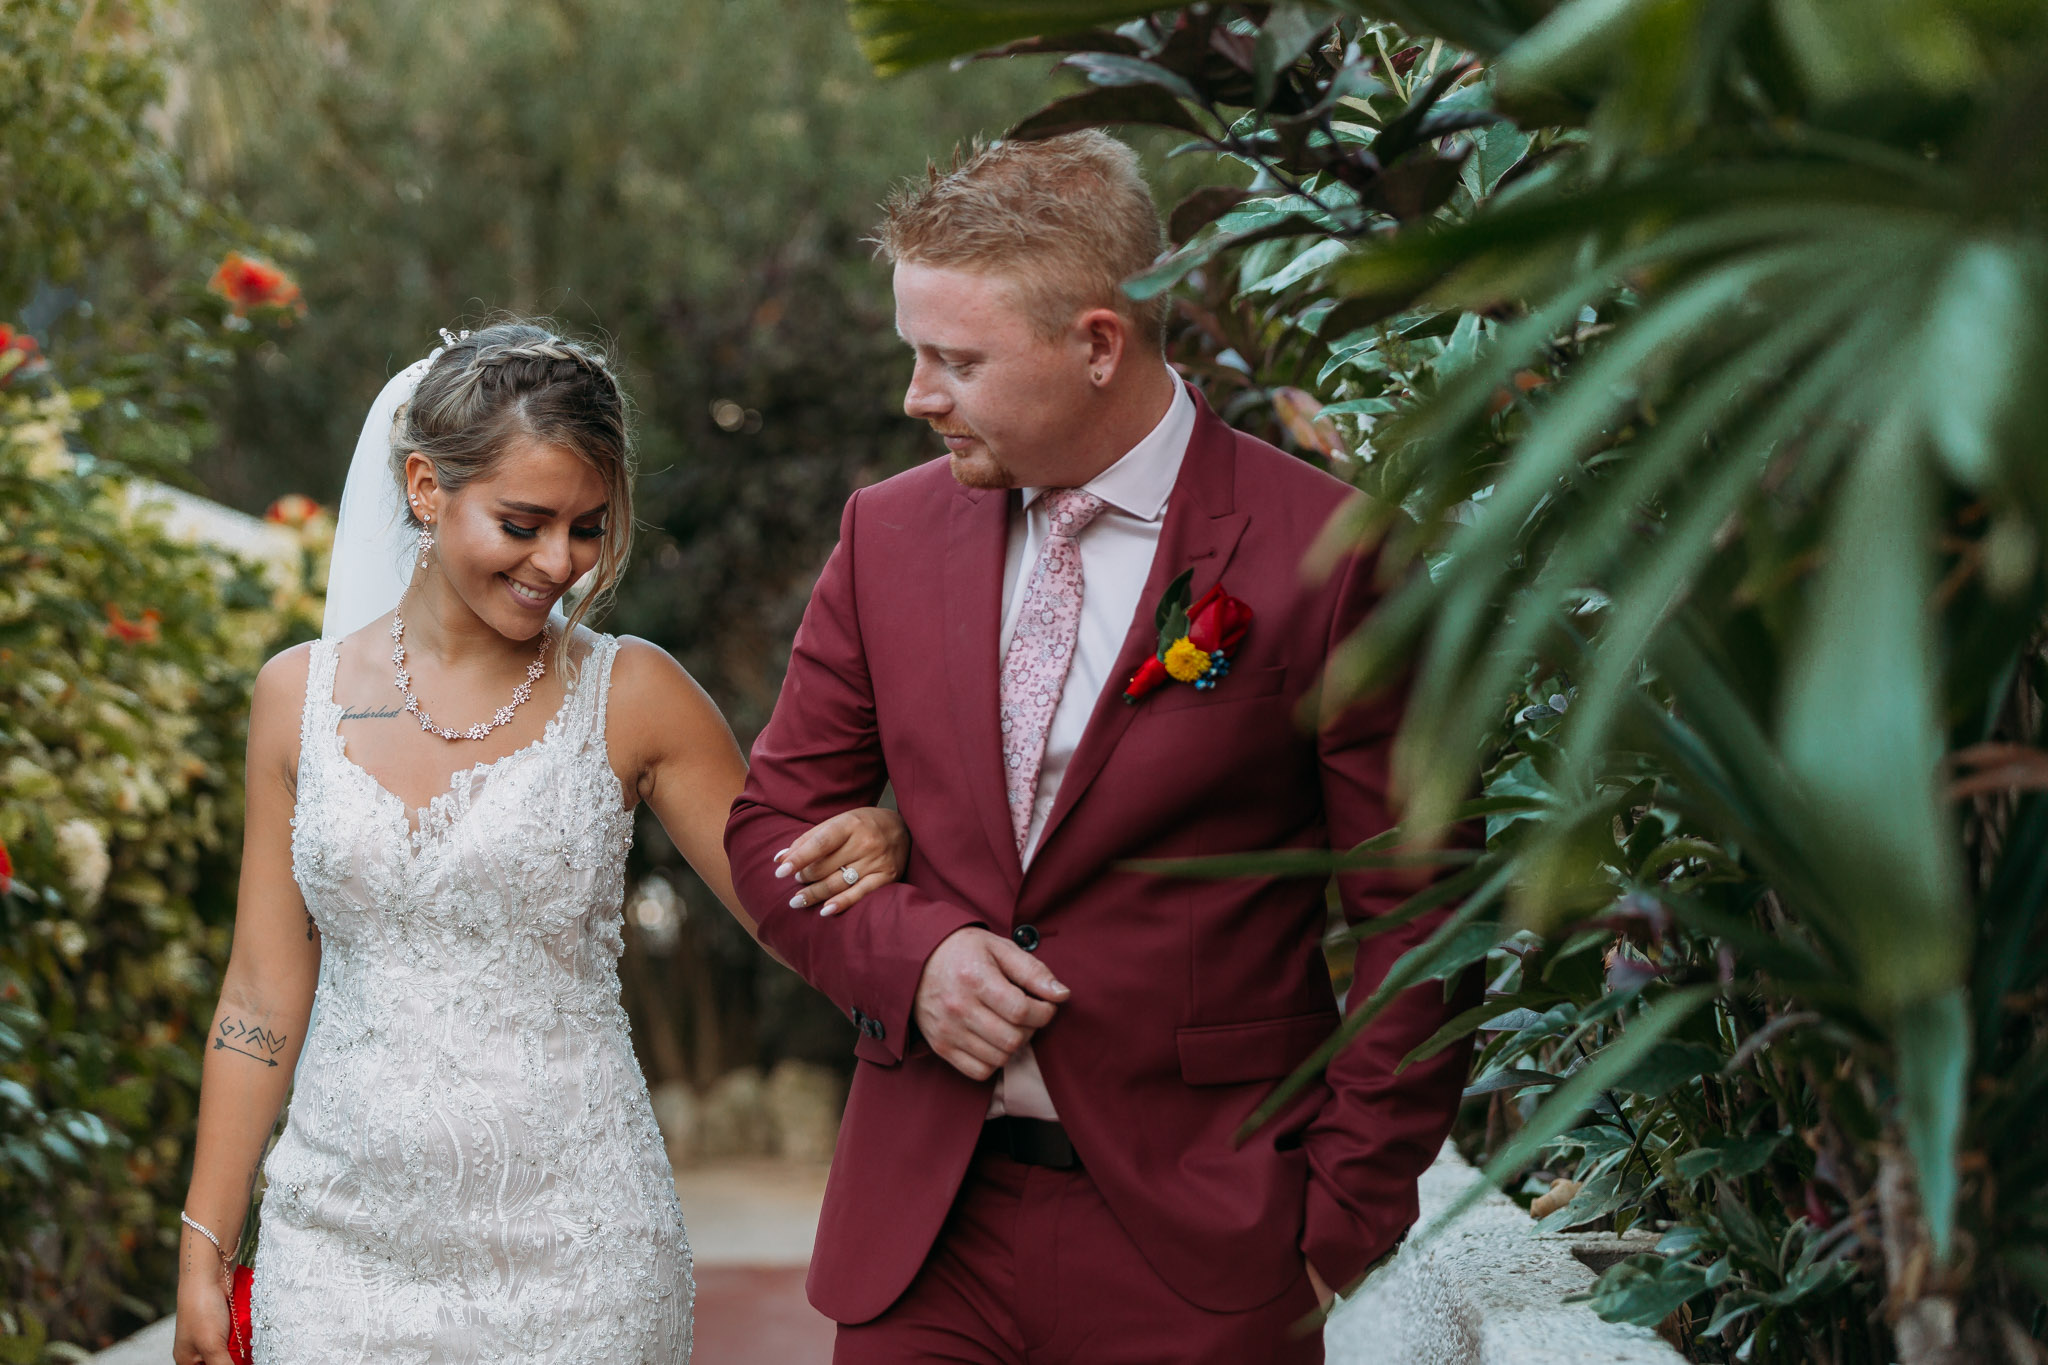 Wedding Photos In Edmonton